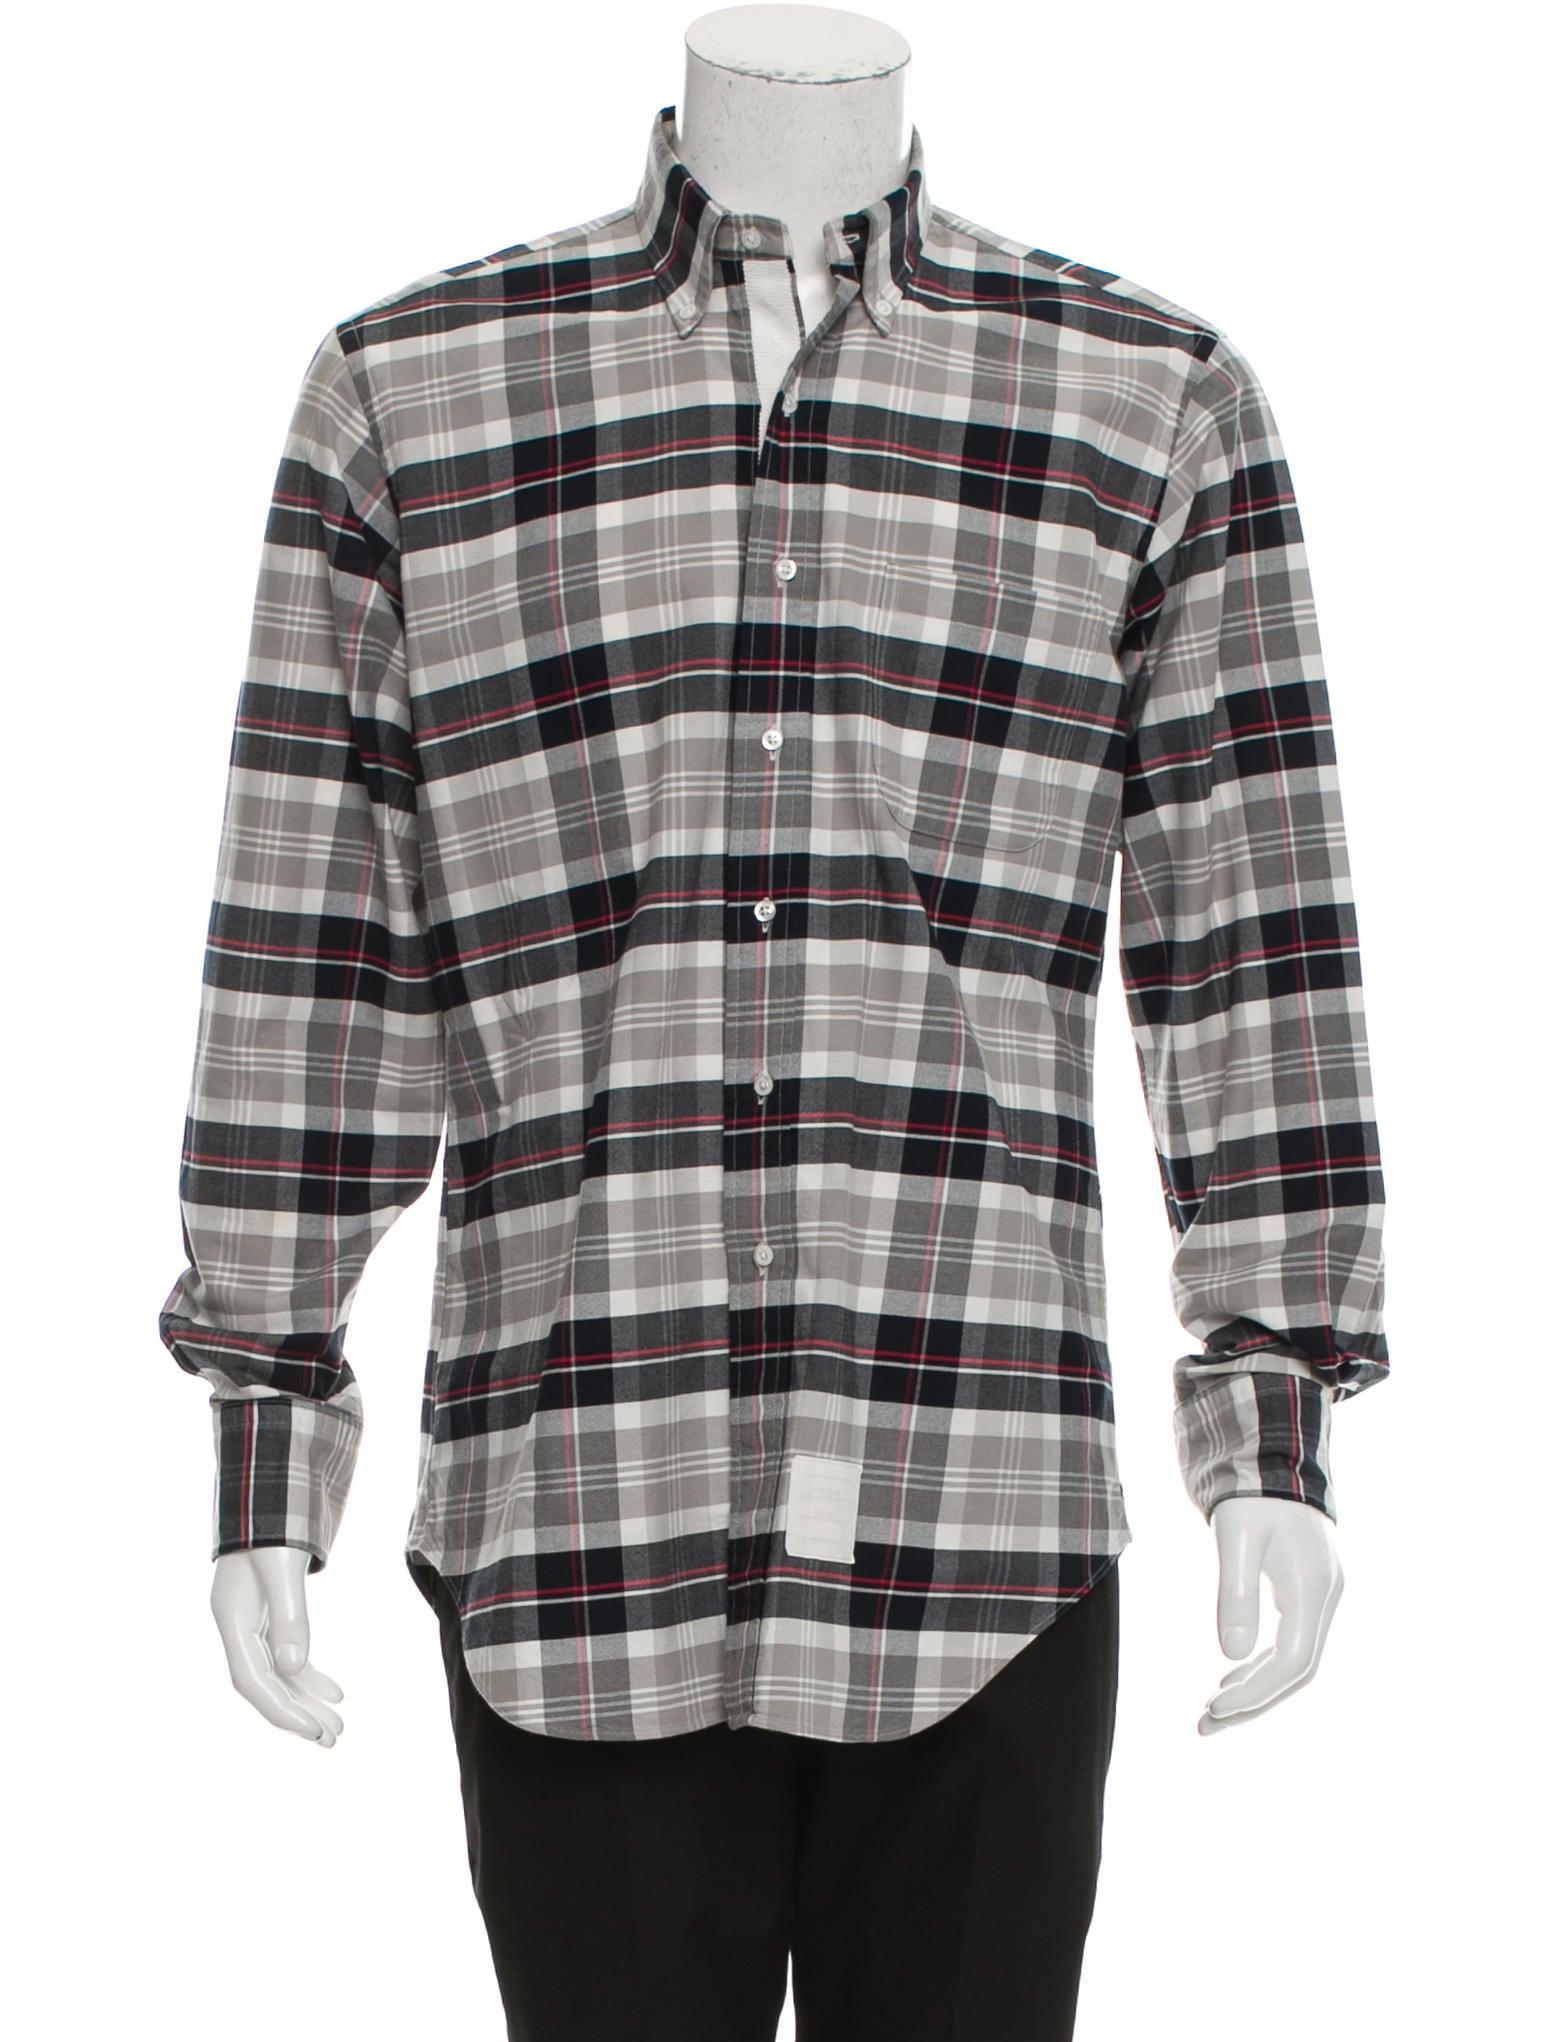 Thom browne plaid button up shirt clothing tho22152 for Thom browne shirt sale